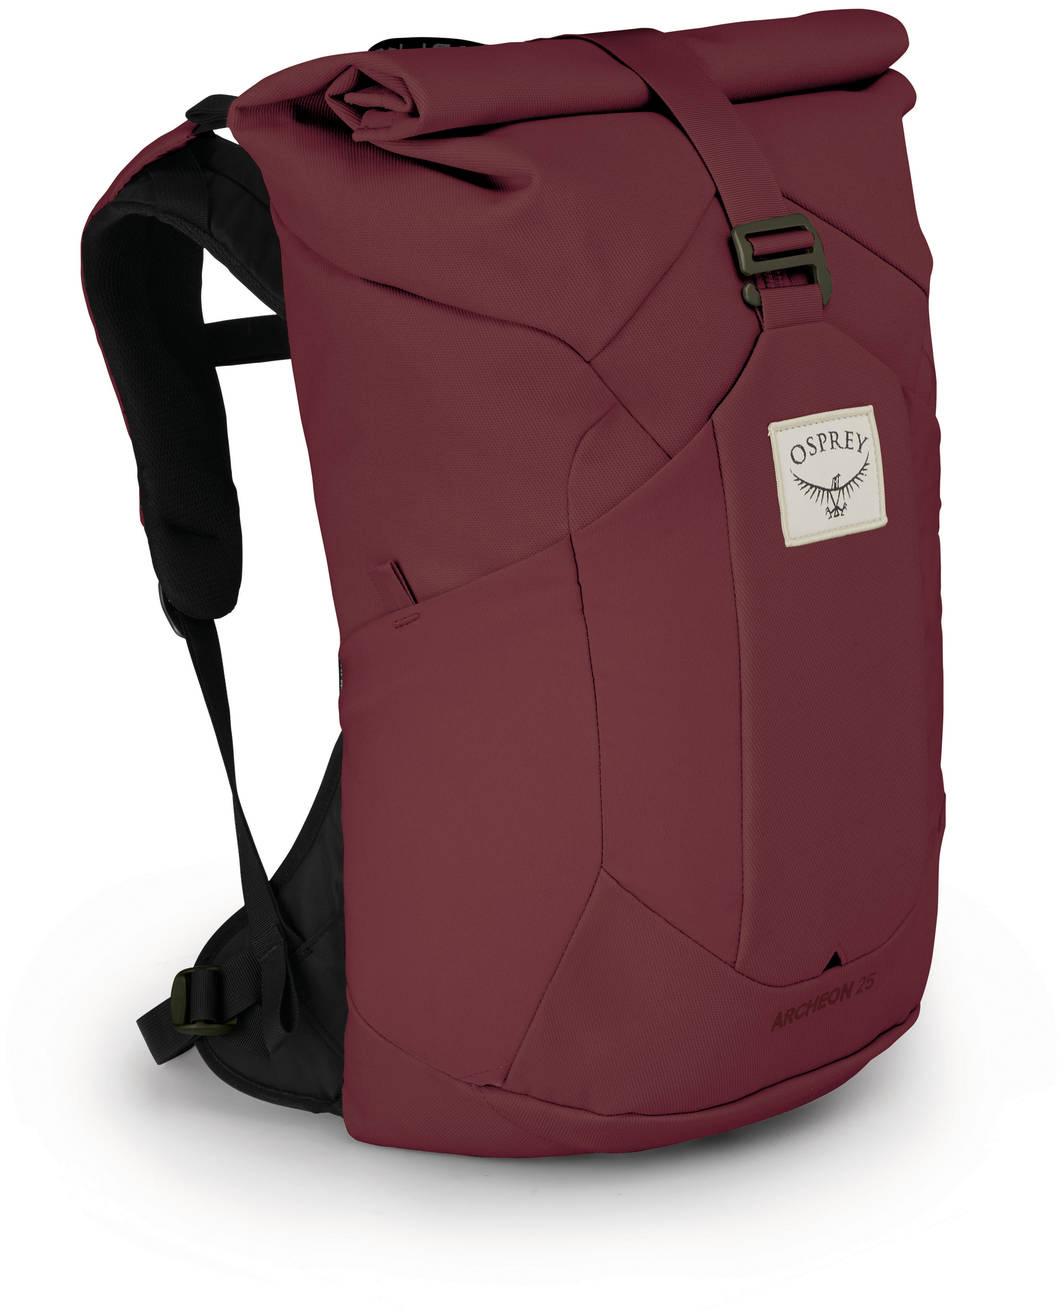 Городские рюкзаки Рюкзак женский Osprey Archeon 25 W's Mud Red Archeon_W_25_S20_Side_Mud_Red_web.jpg